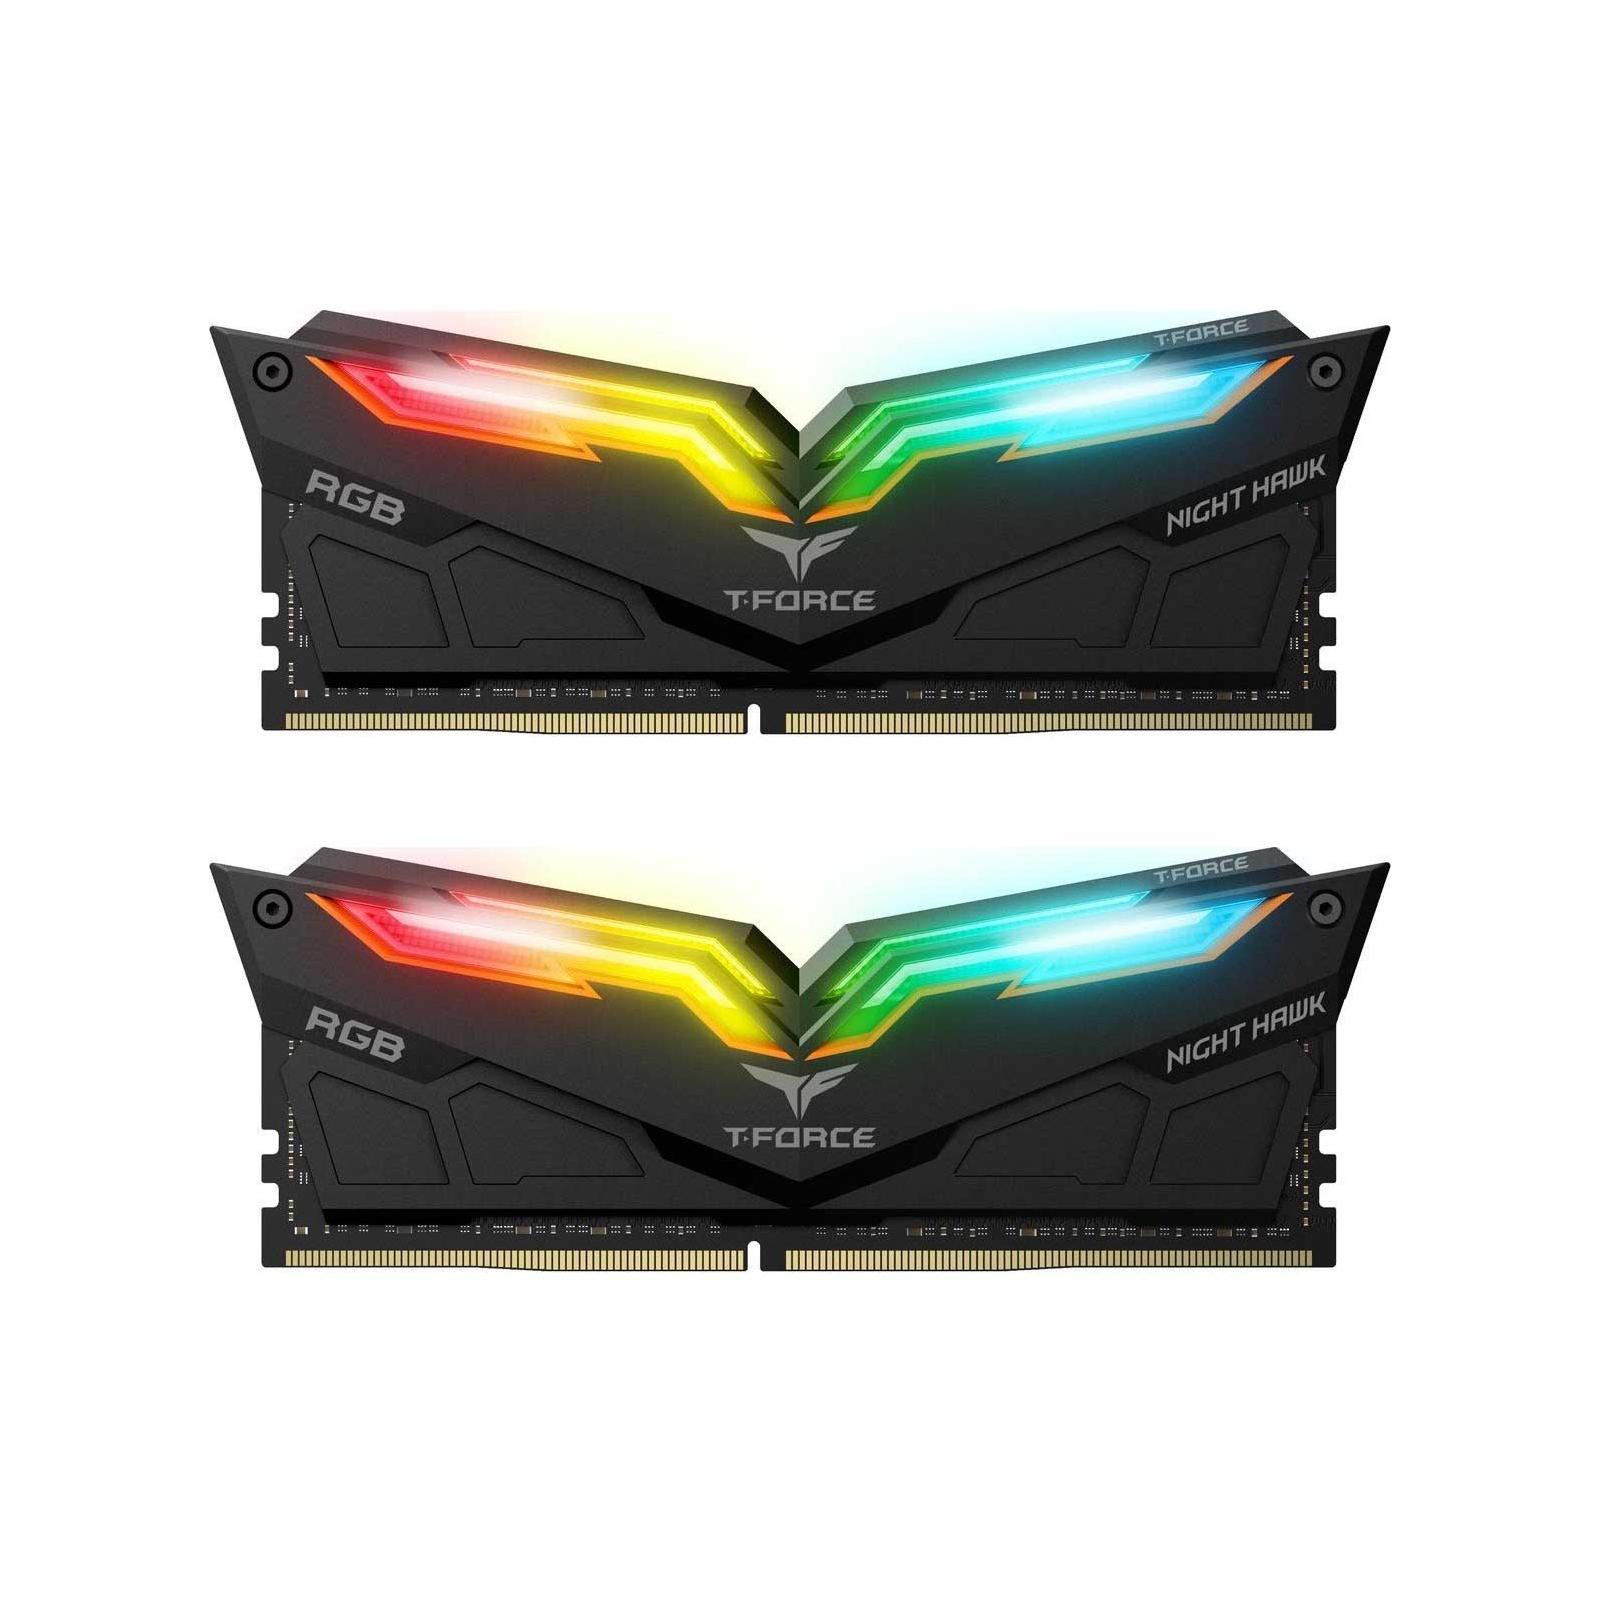 Модуль памяти для компьютера DDR4 32GB (2x16GB) 3200 MHz T-Force Night Hawk RGB Black Team (TF1D432G3200HC16CDC0)